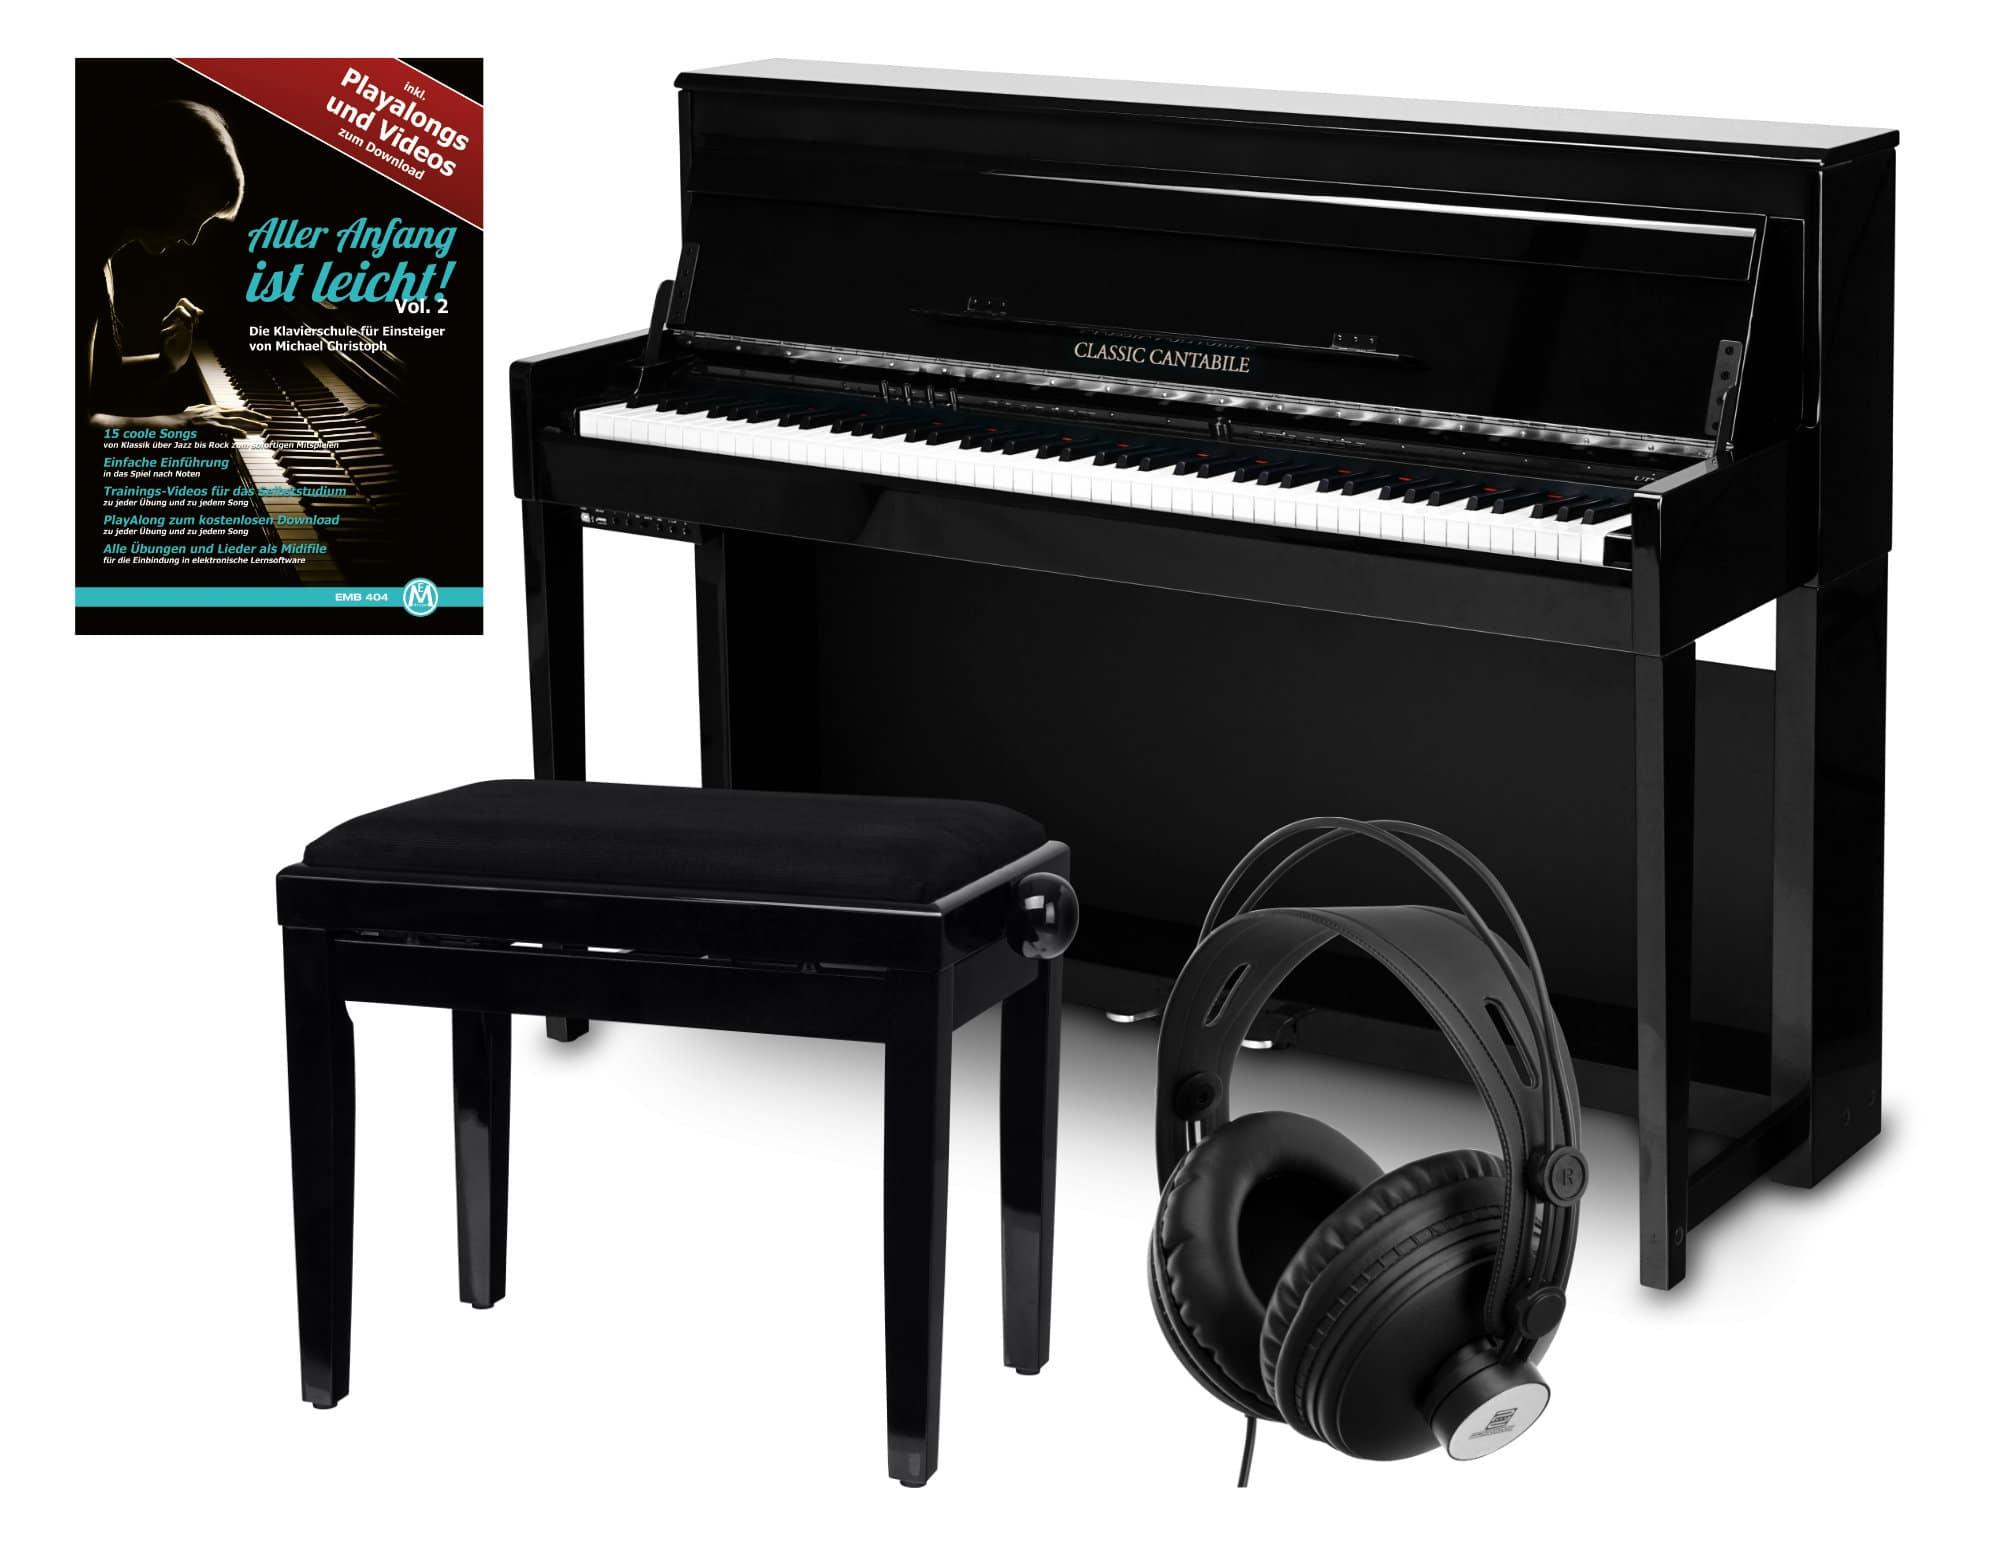 Digitalpianos - Classic Cantabile UP 1 SH E Piano Schwarz Hochglanz Deluxe Set - Onlineshop Musikhaus Kirstein